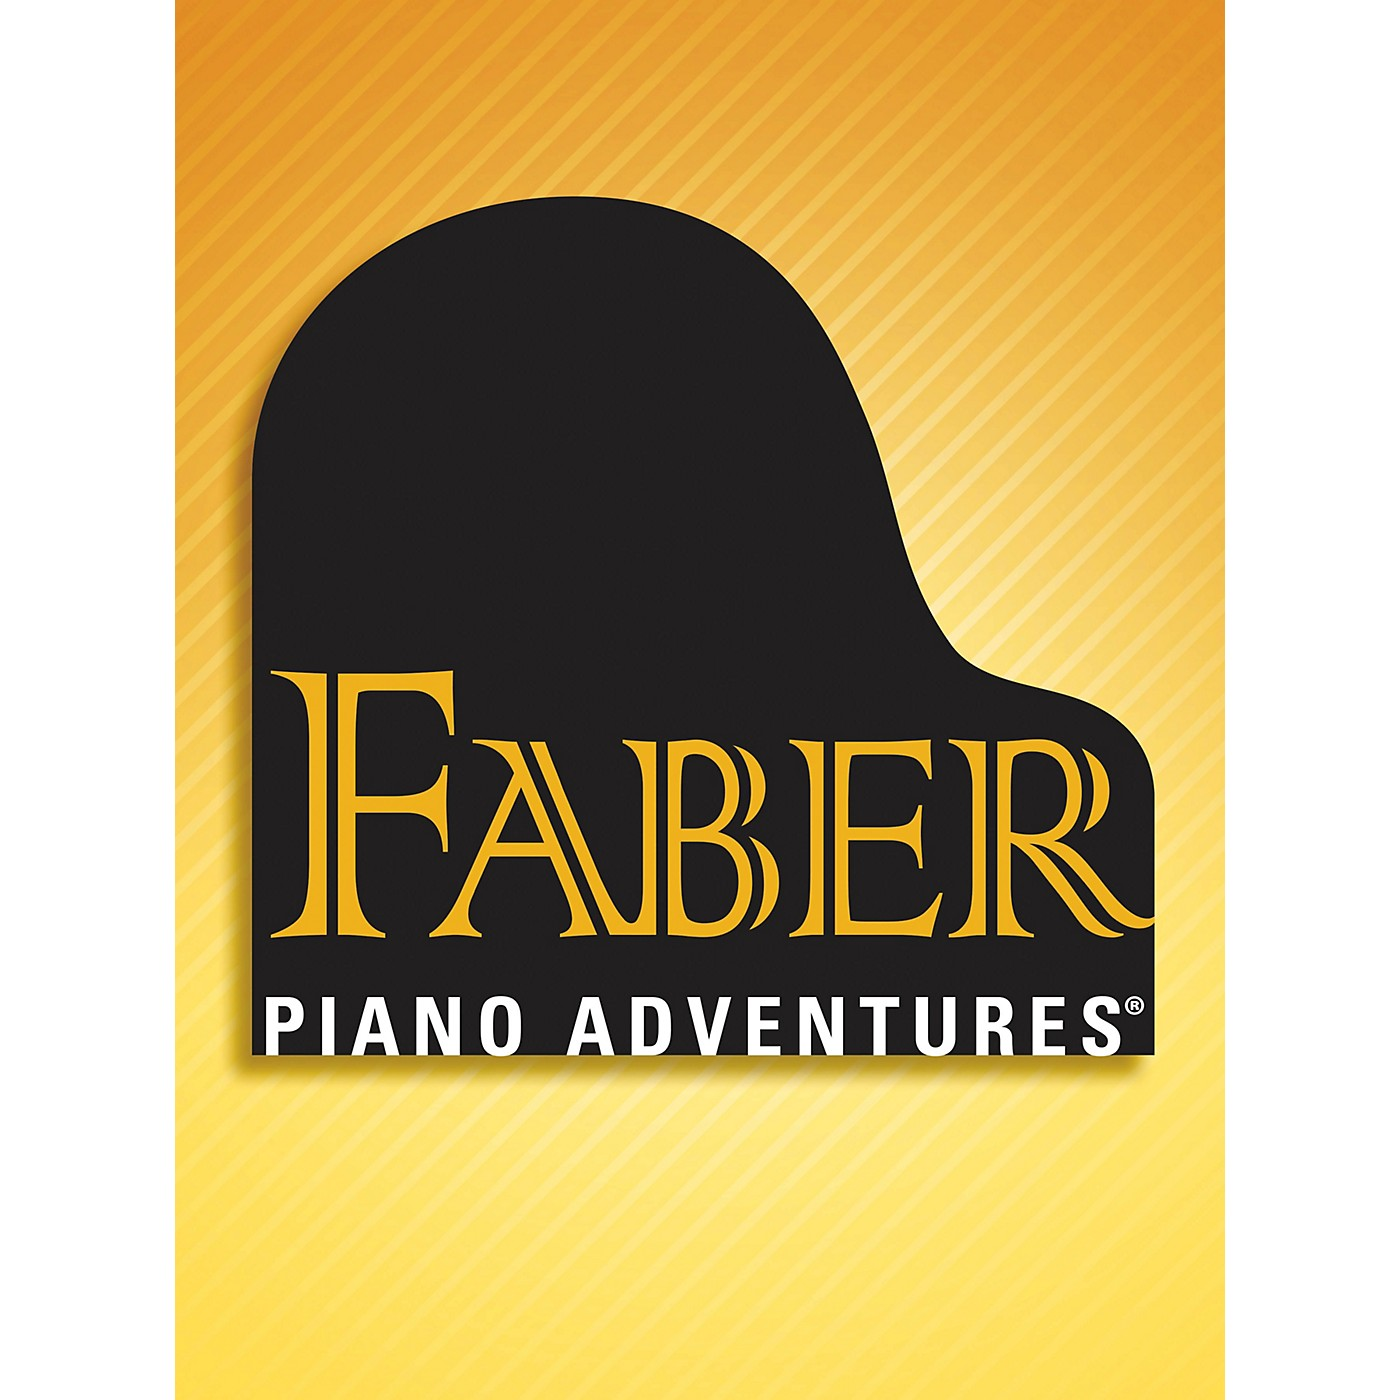 Faber Piano Adventures FunTime® Favorites (Level 3A-3B) Faber Piano Adventures® Series Disk thumbnail